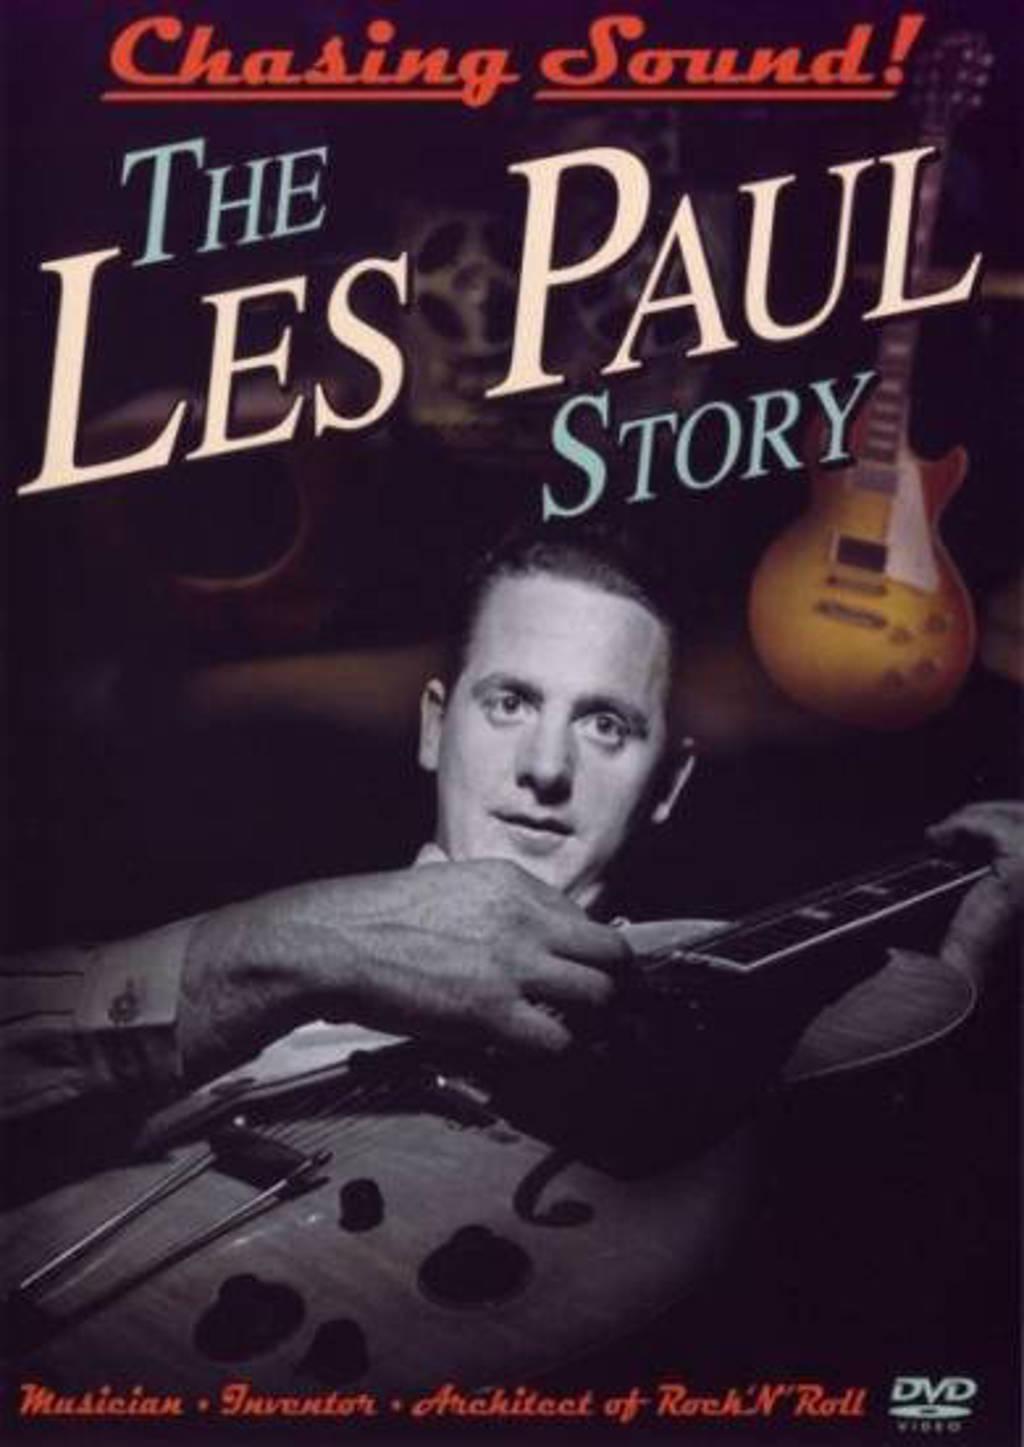 Les Paul - chasing sound (DVD)